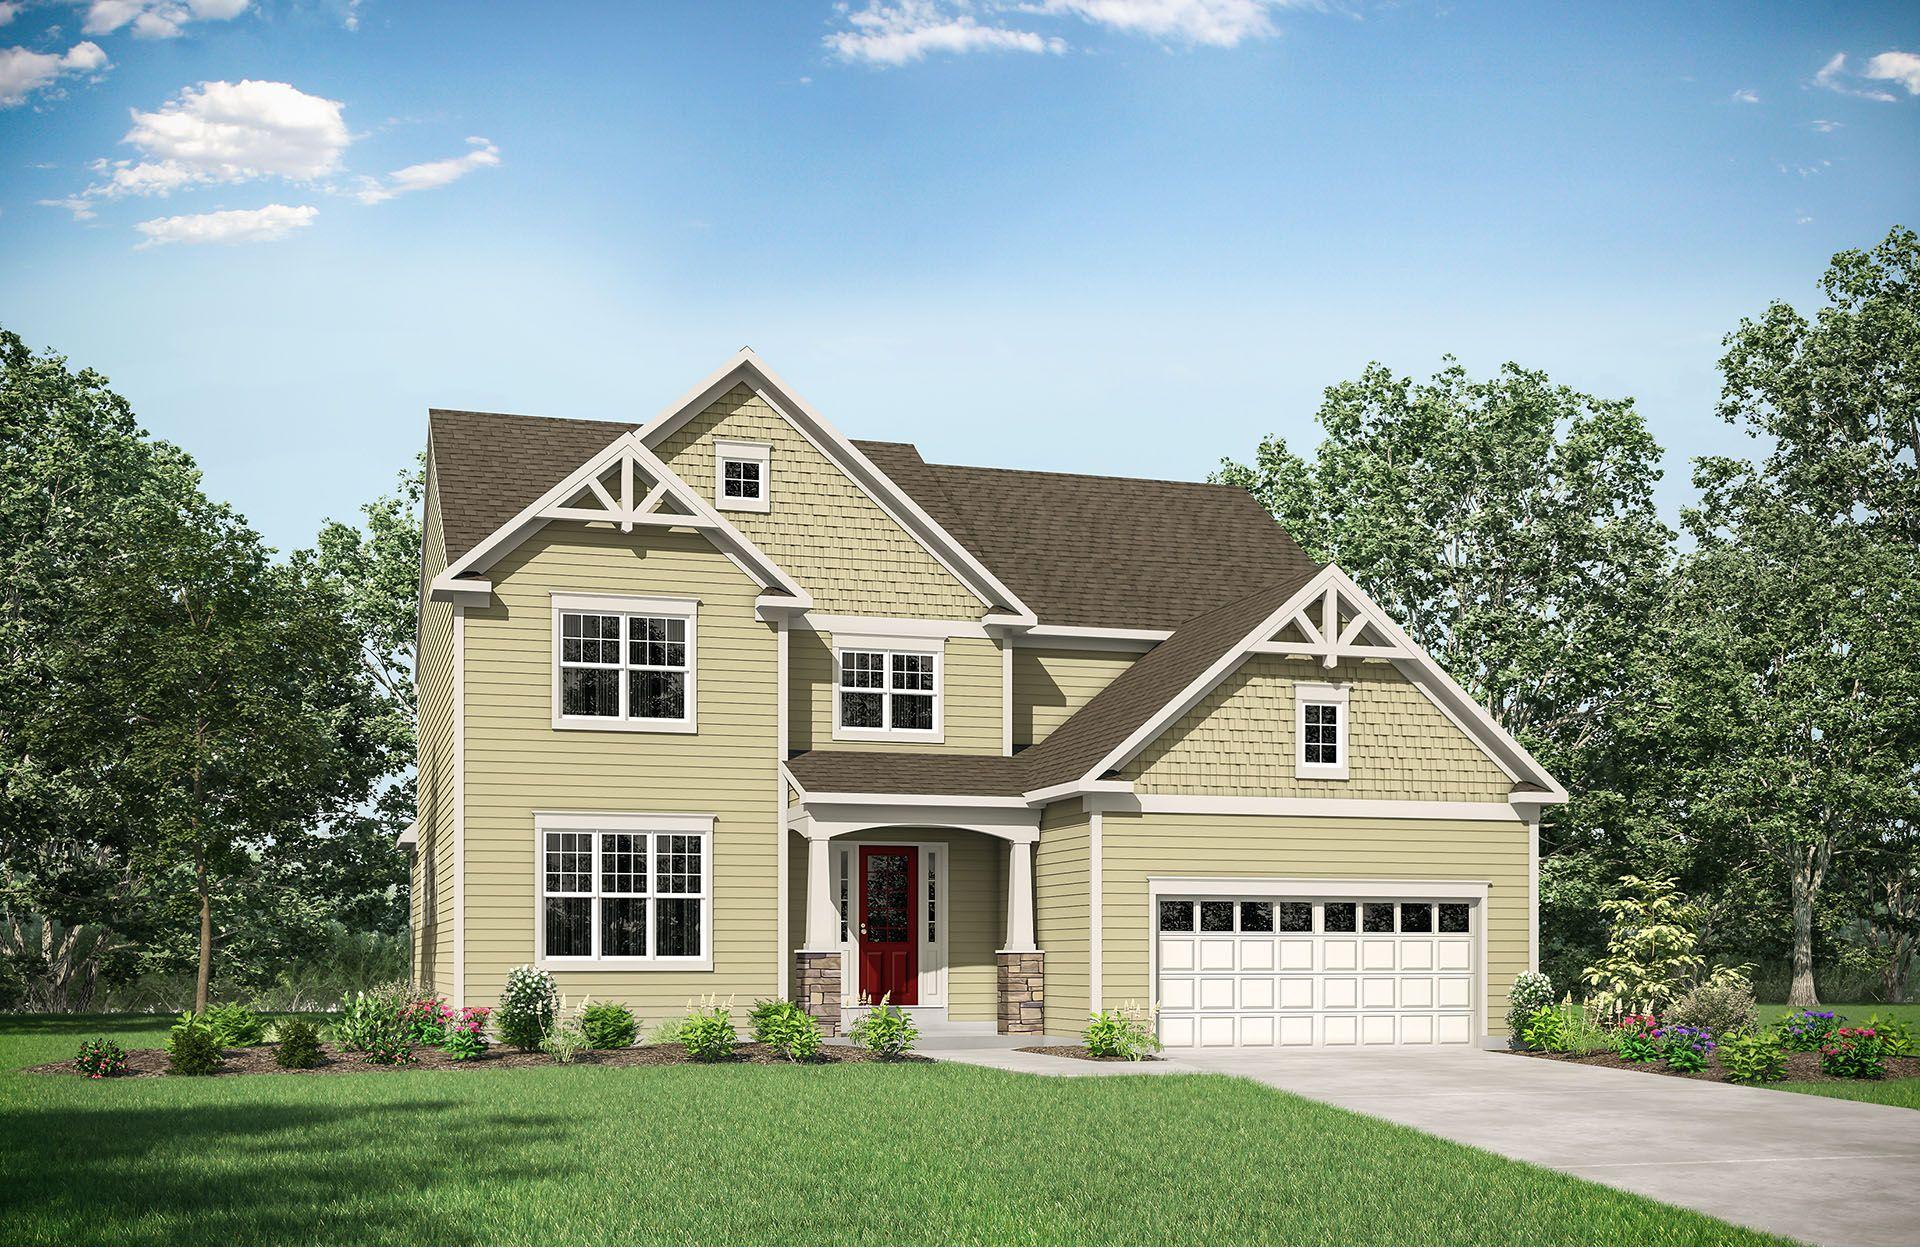 Single Family for Active at Rowan 68 Edgewater Drive Fredericksburg, Virginia 22406 United States